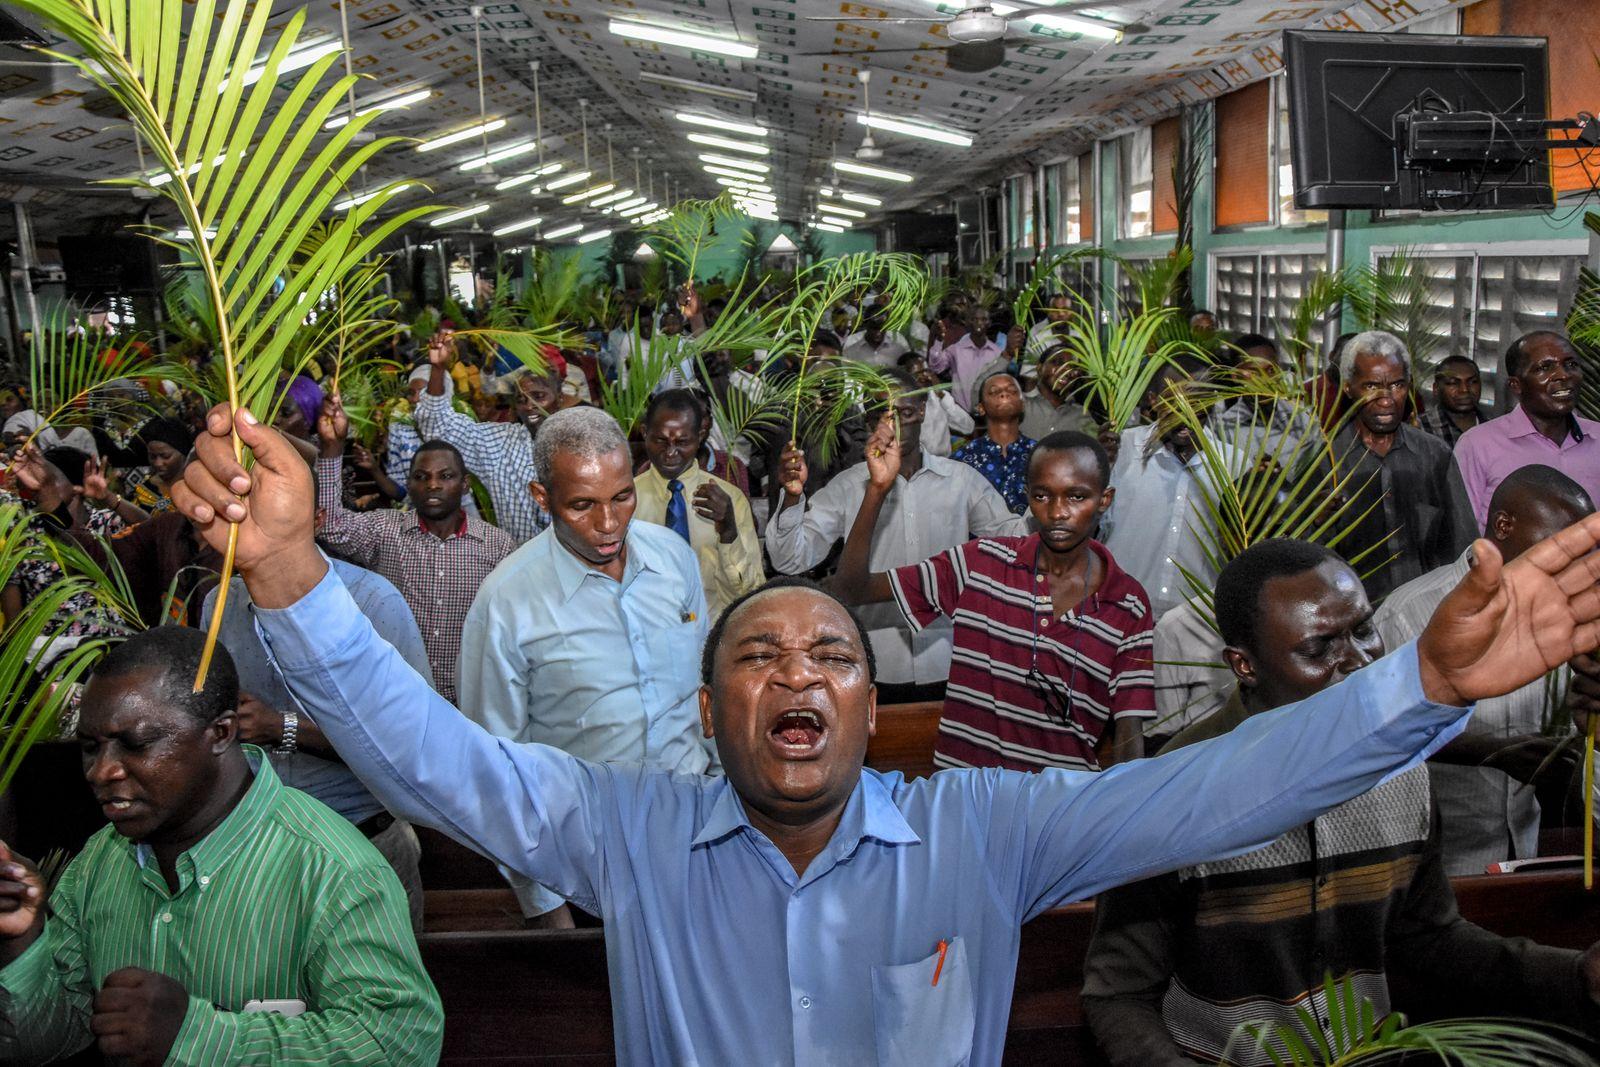 TANZANIA-HEALTH-VIRUS-RELIGION